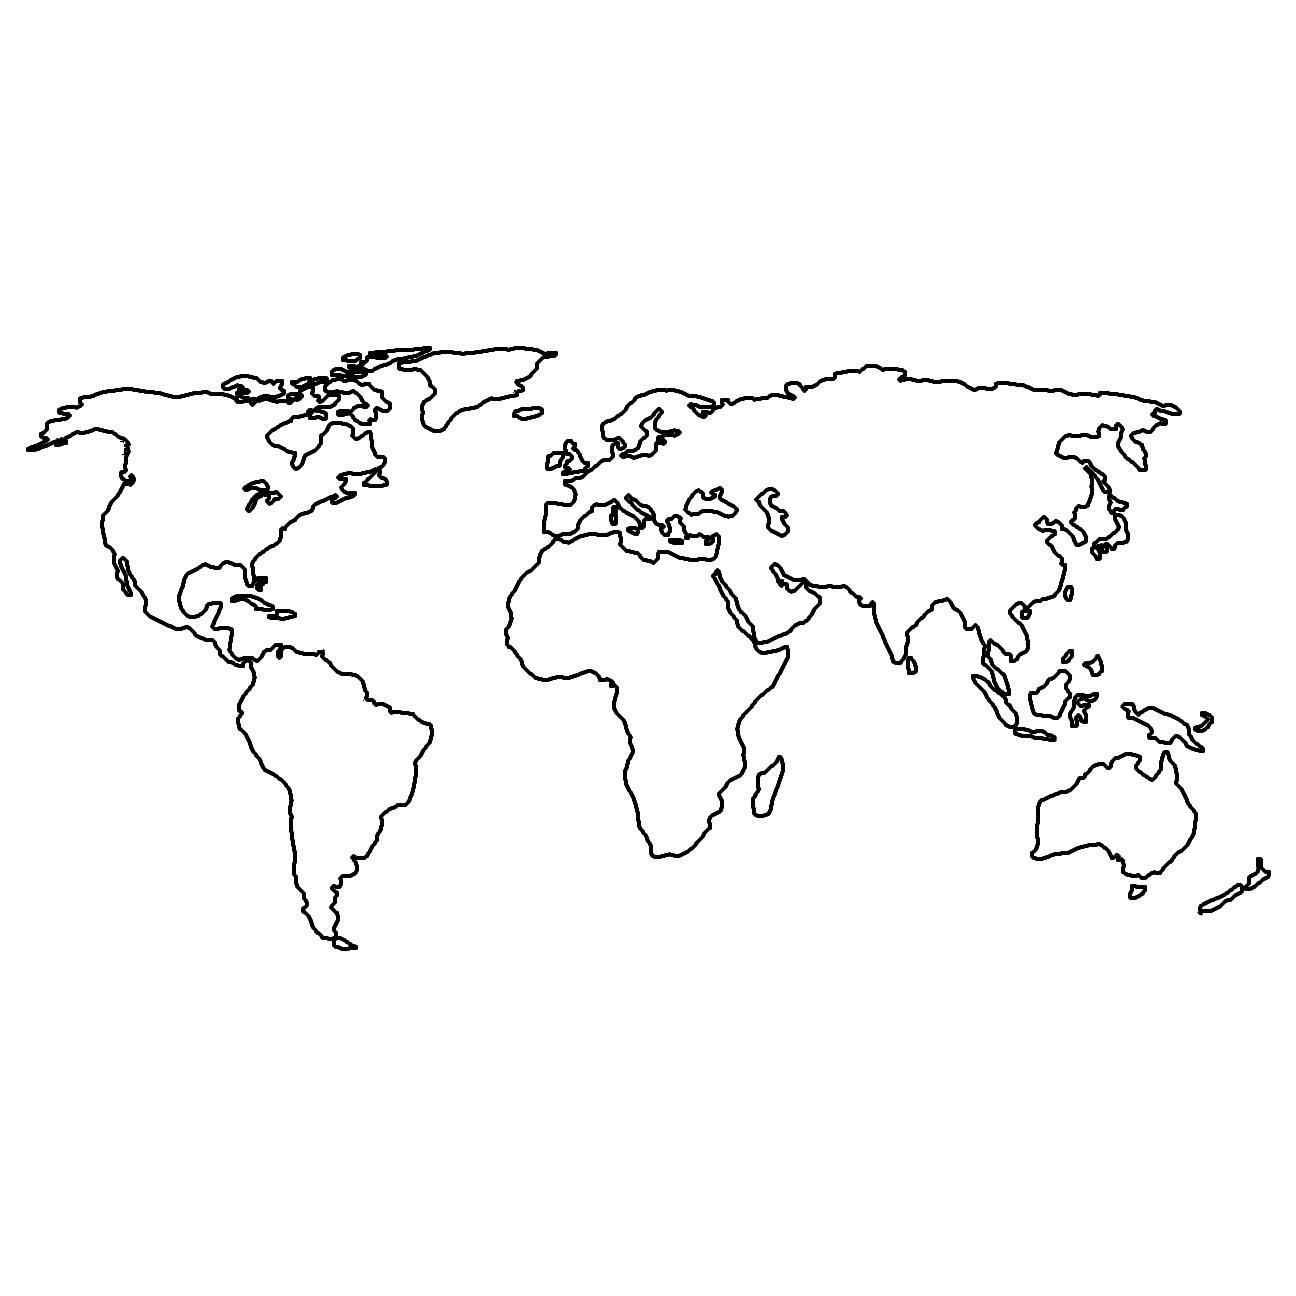 Westphalian Foundations of Modern International Relations, Global Politics and Global Security